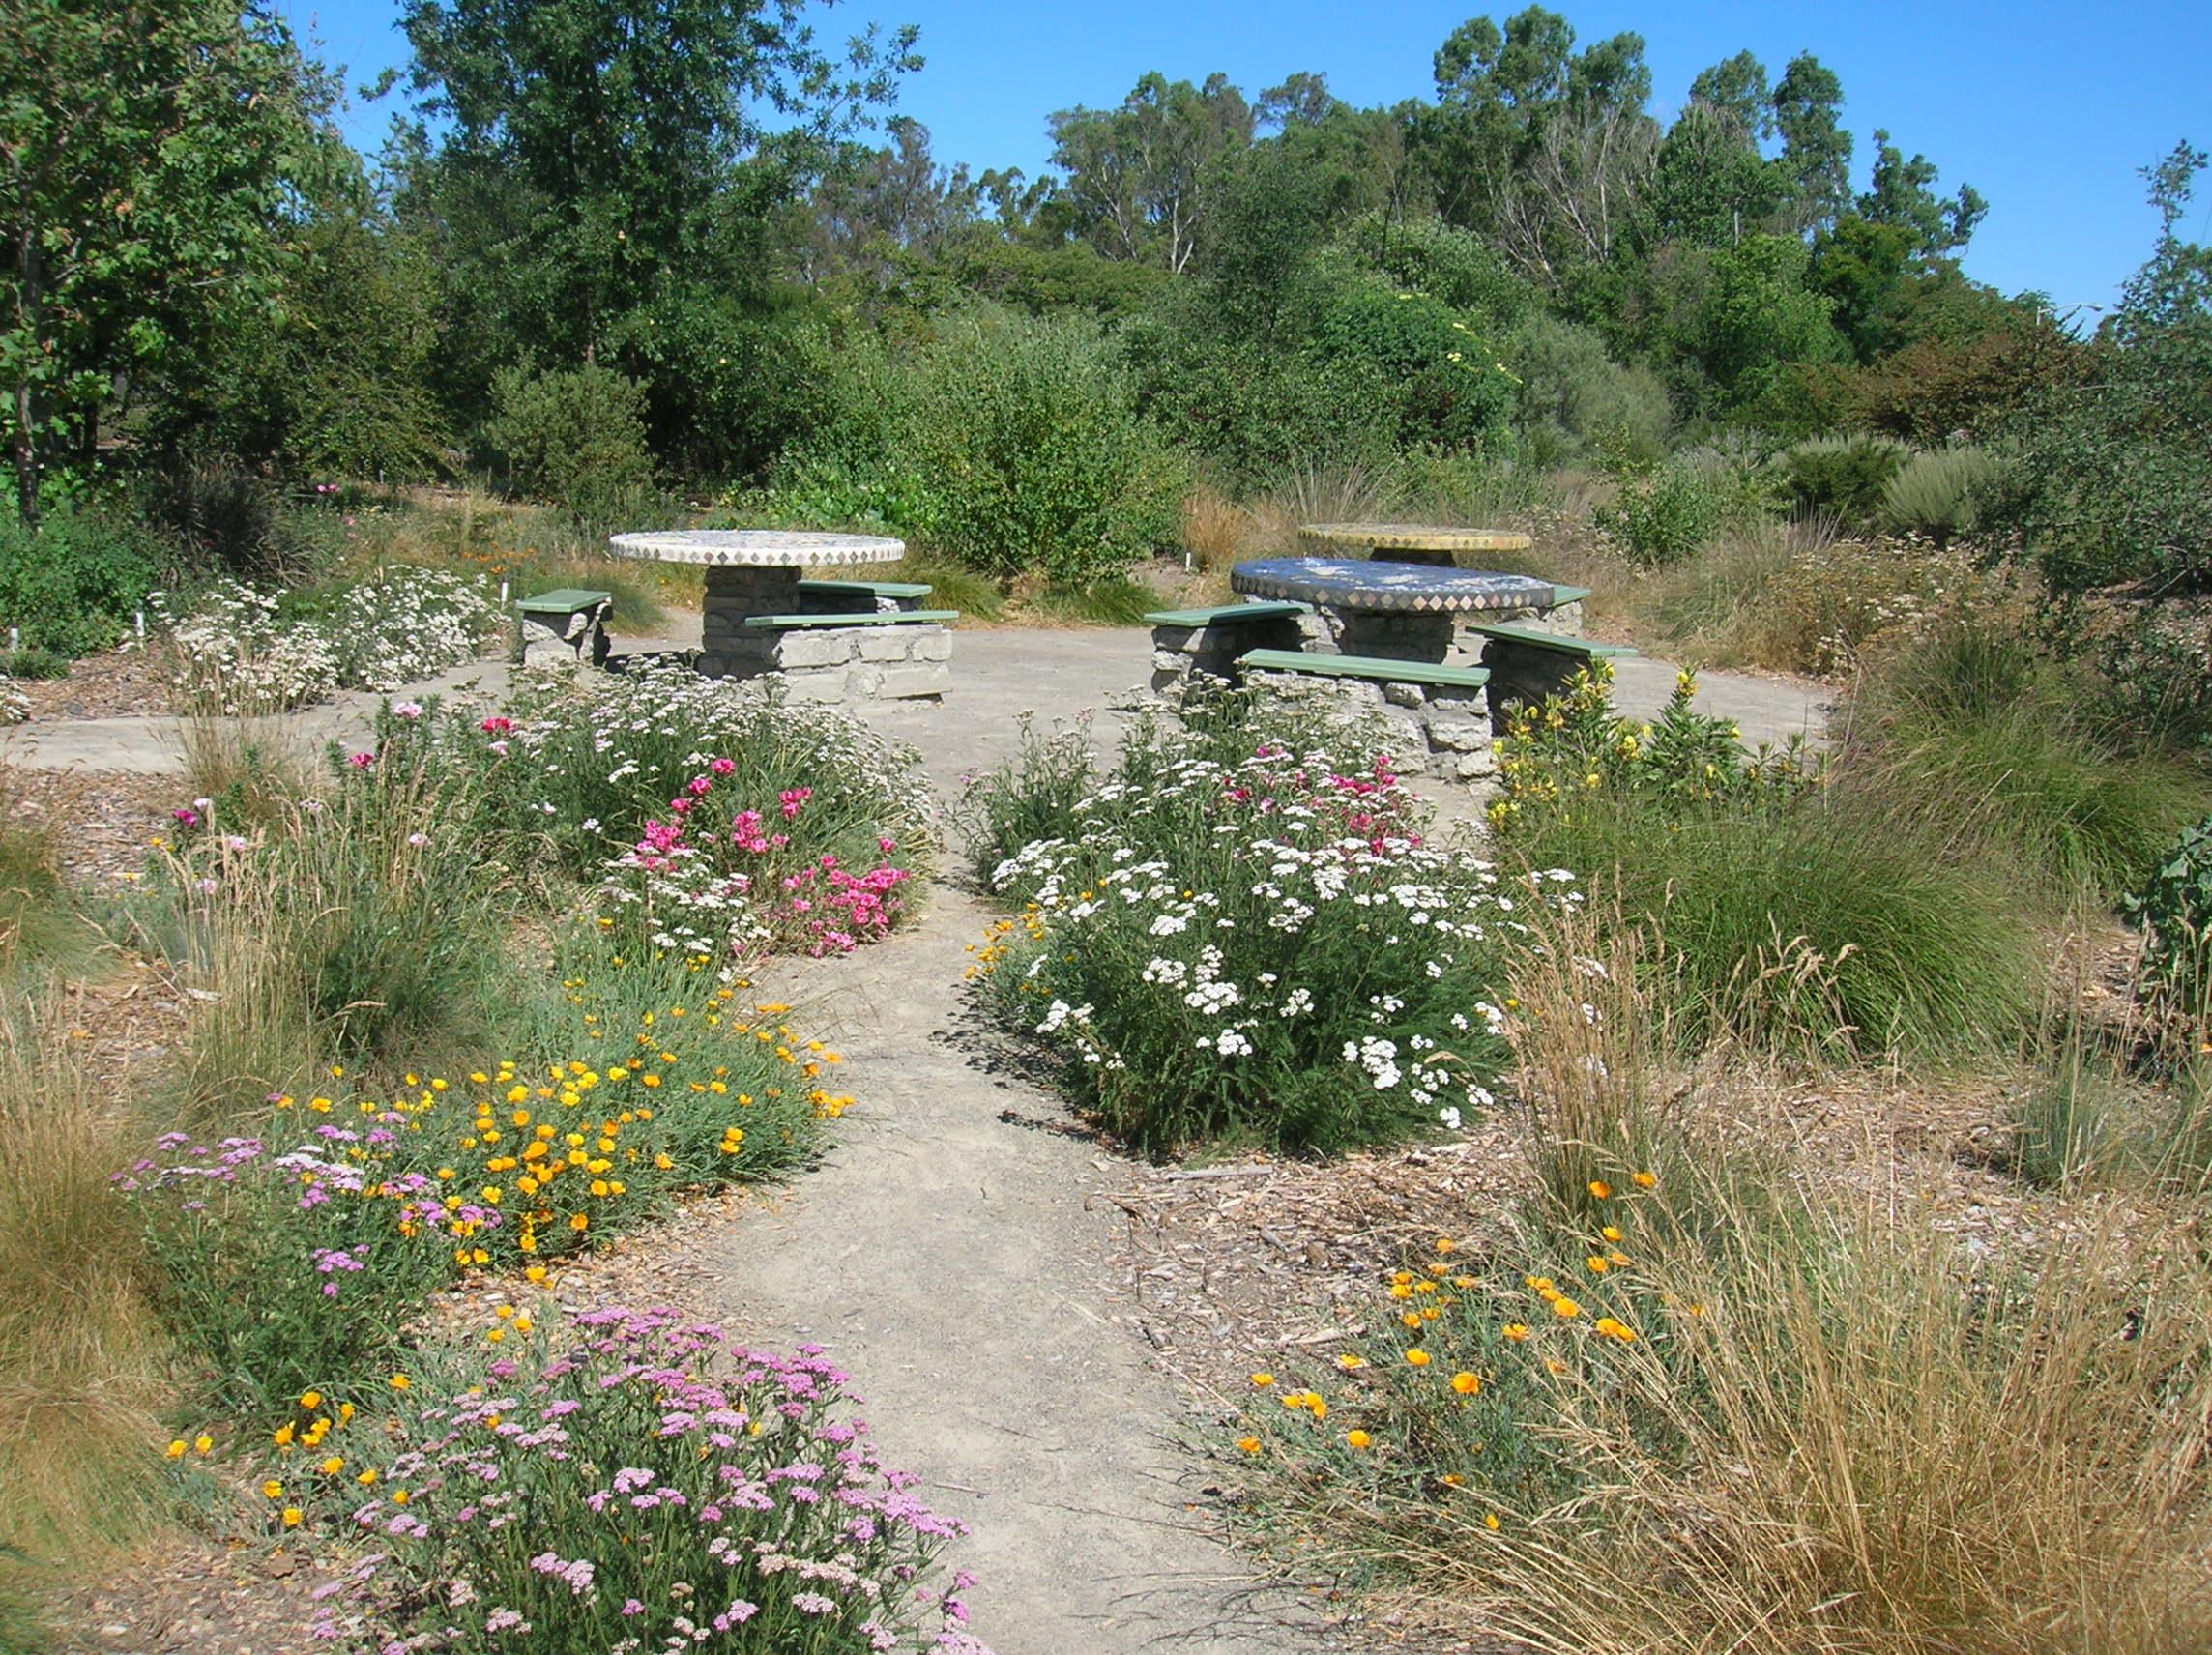 The Granada Native Garden Newsletter A Demonstration Garden for